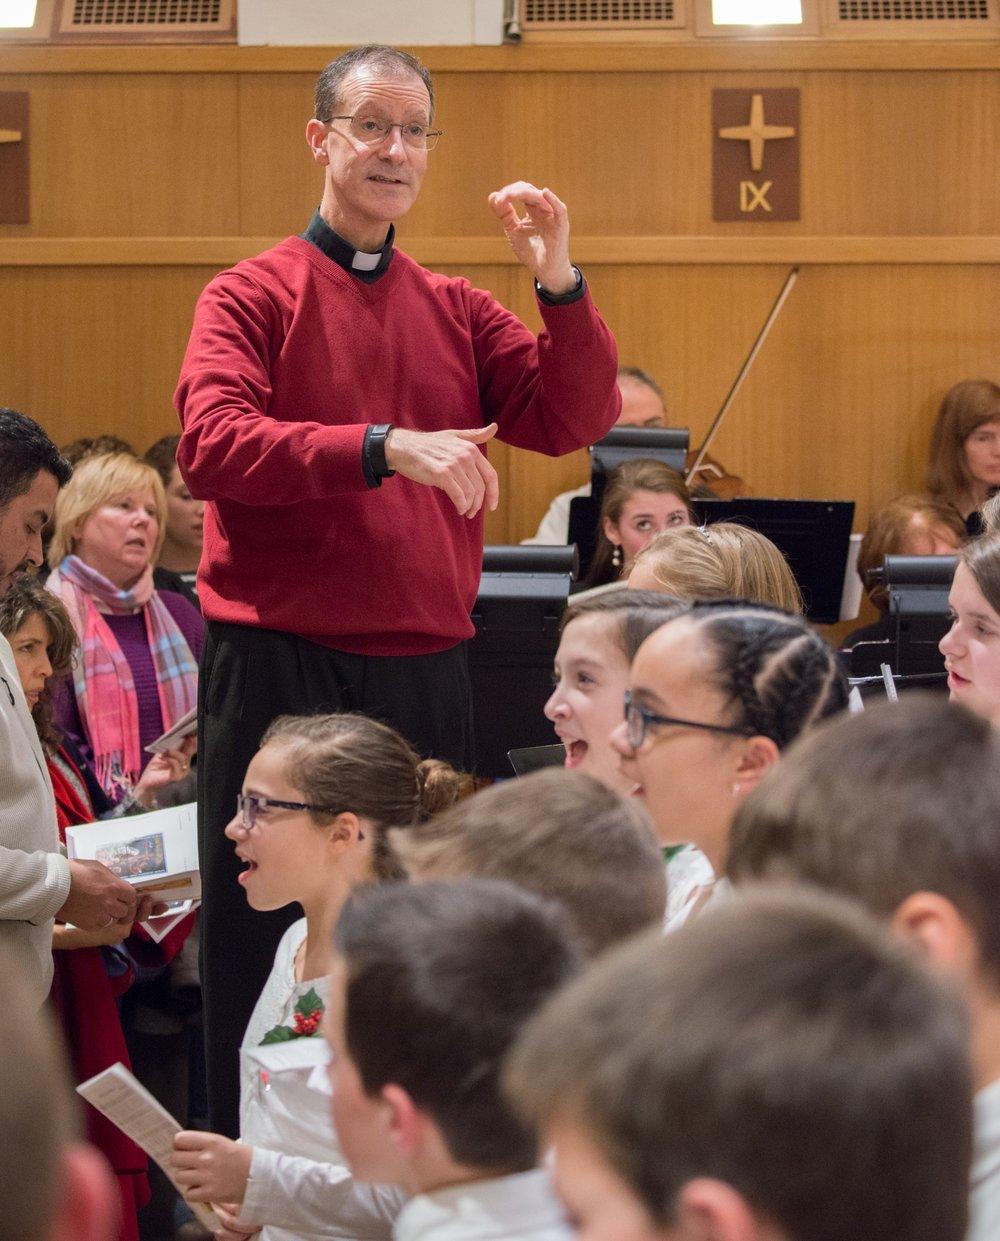 Fr. David Conducting